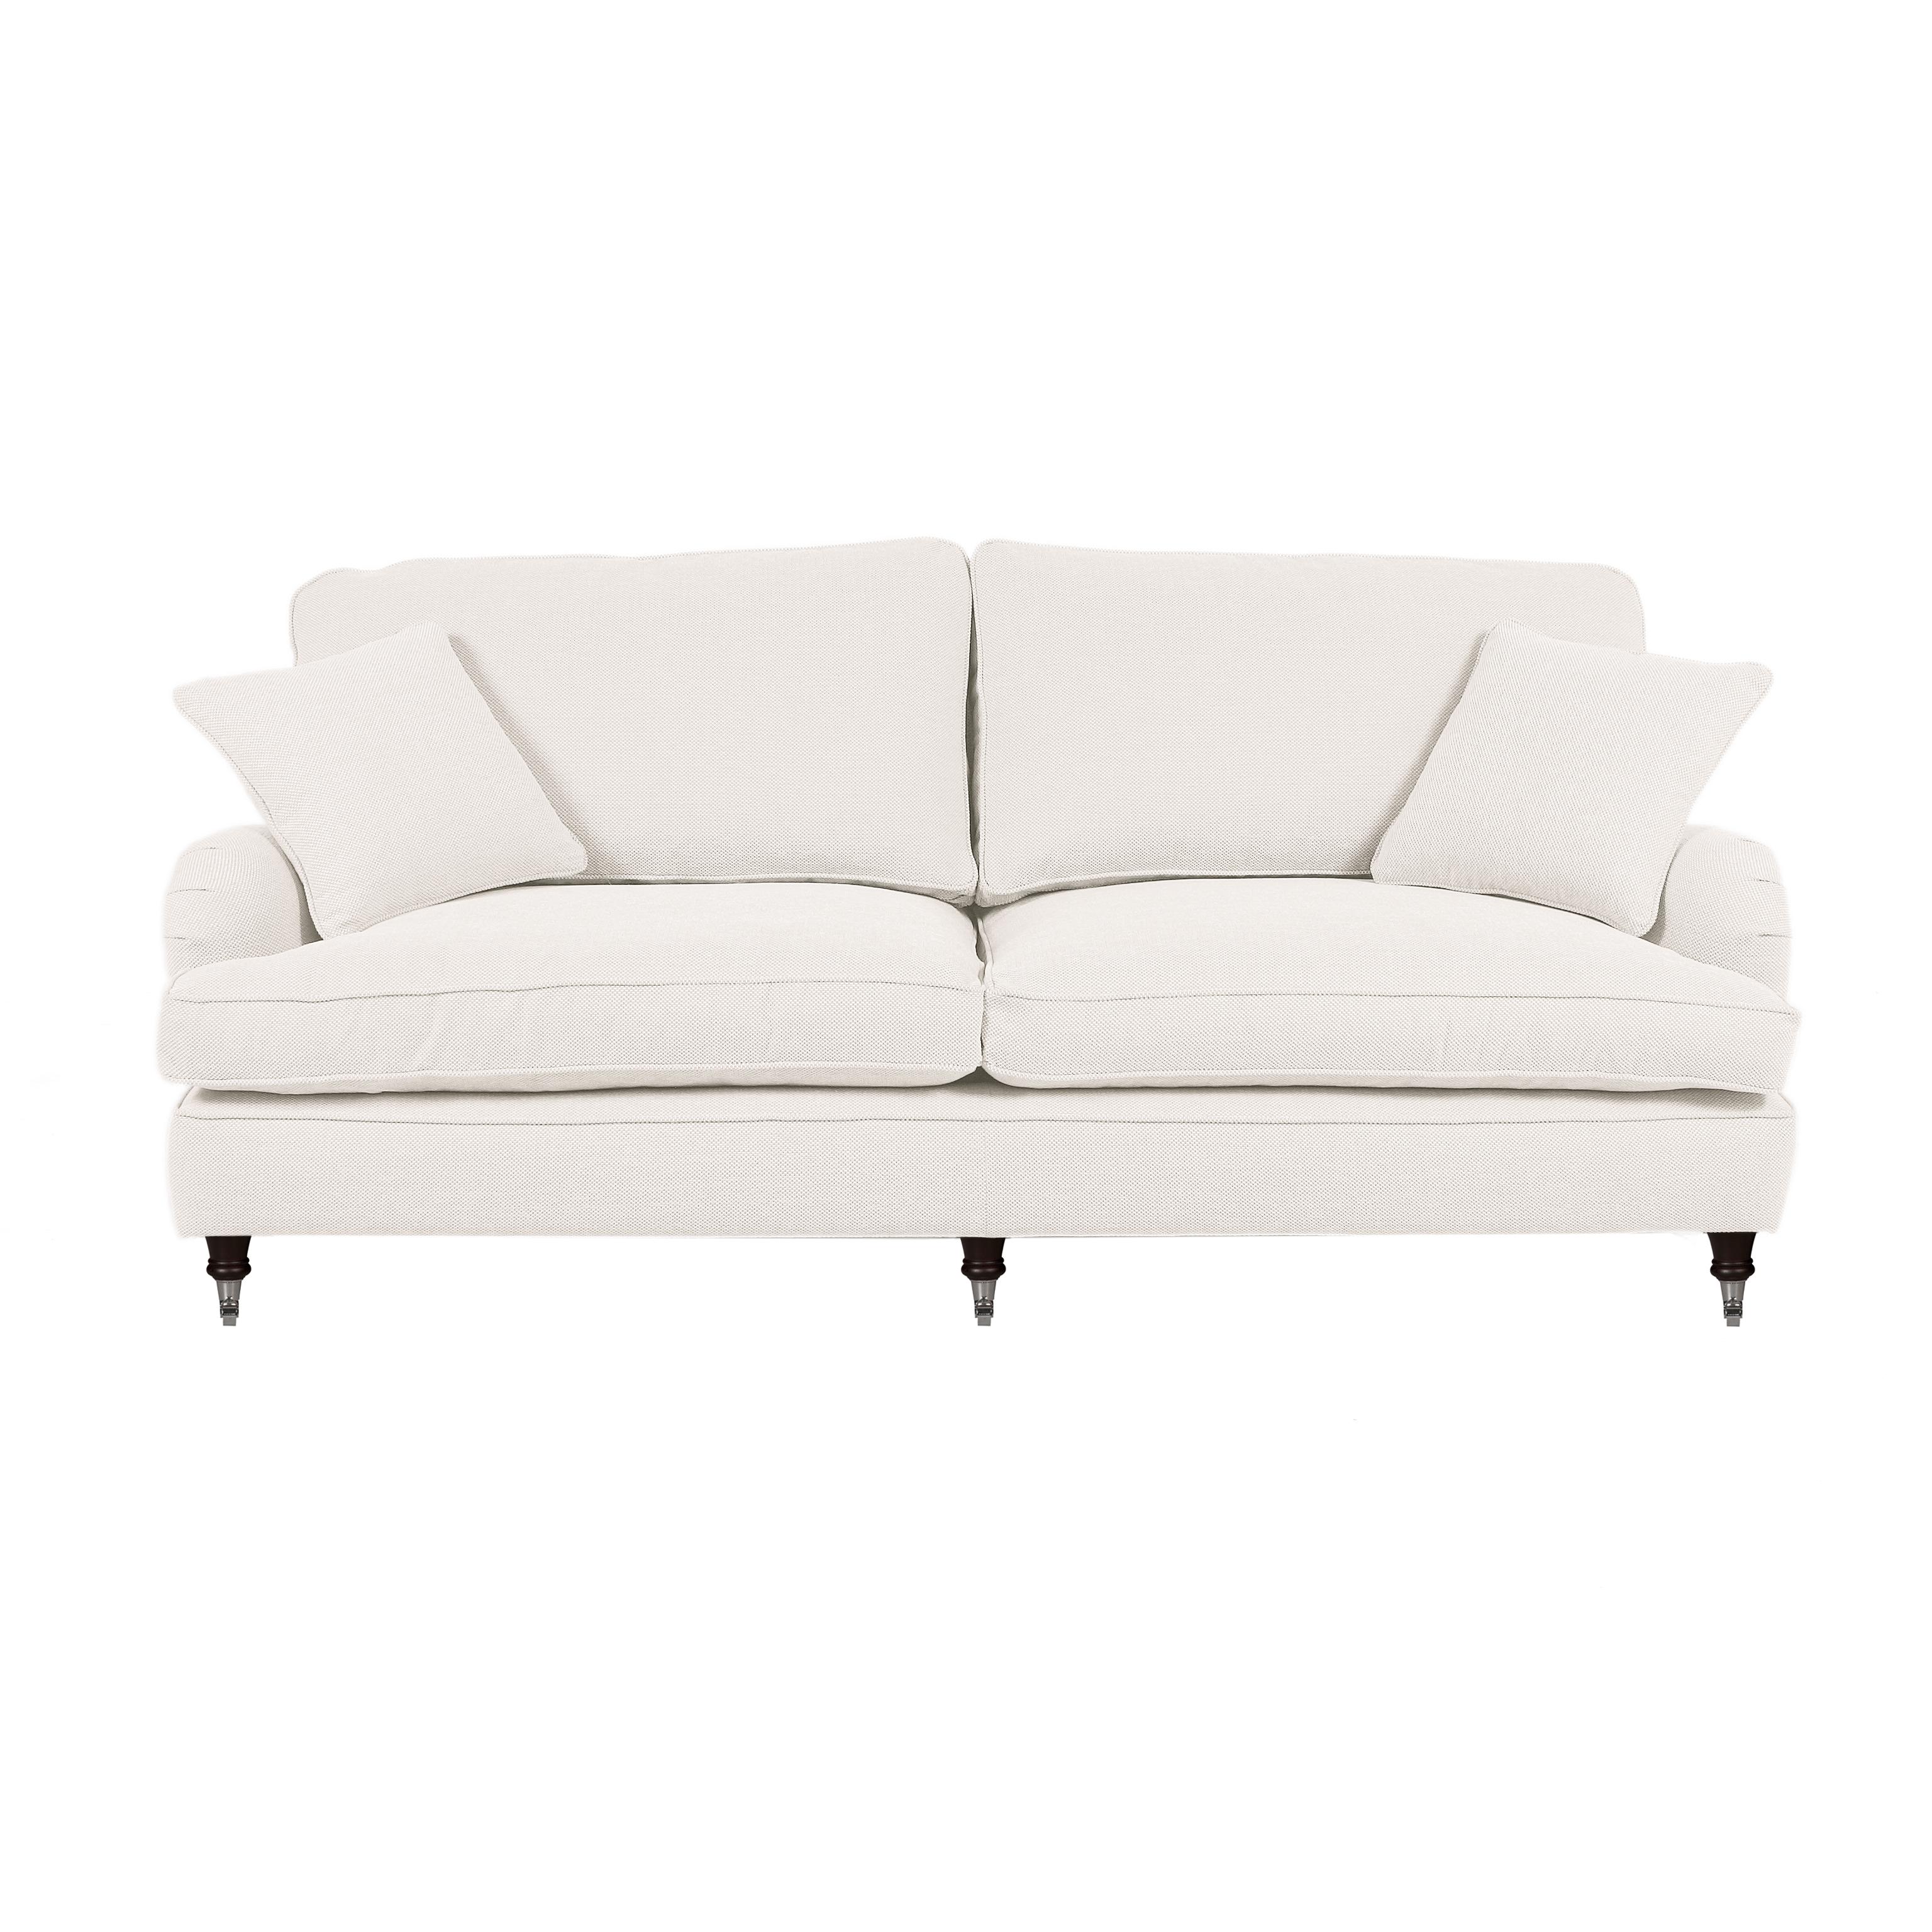 Howard soffa 3-sits - englesson.se